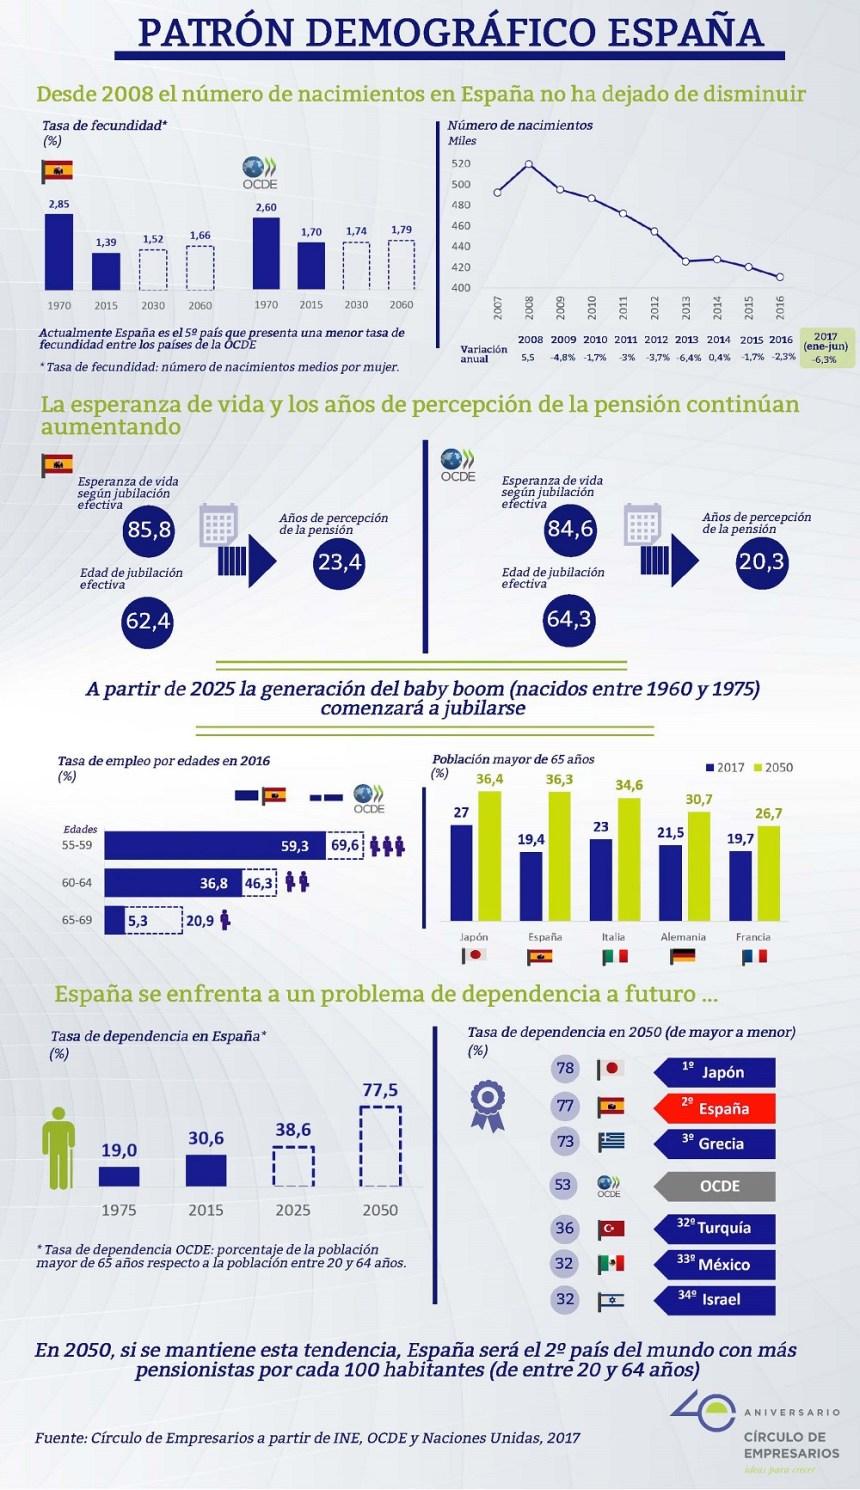 Patrón demográfico de España